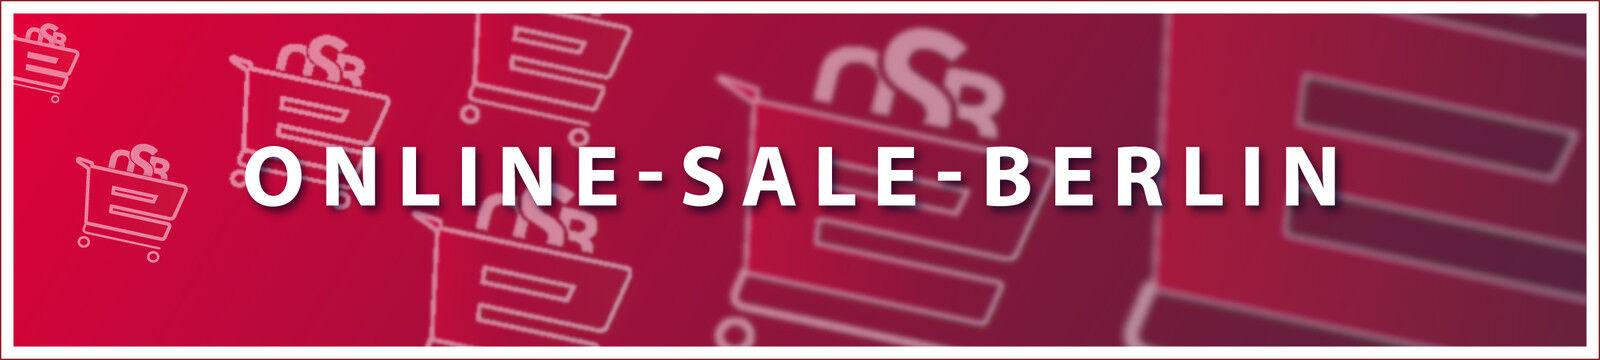 online-sale-berlin